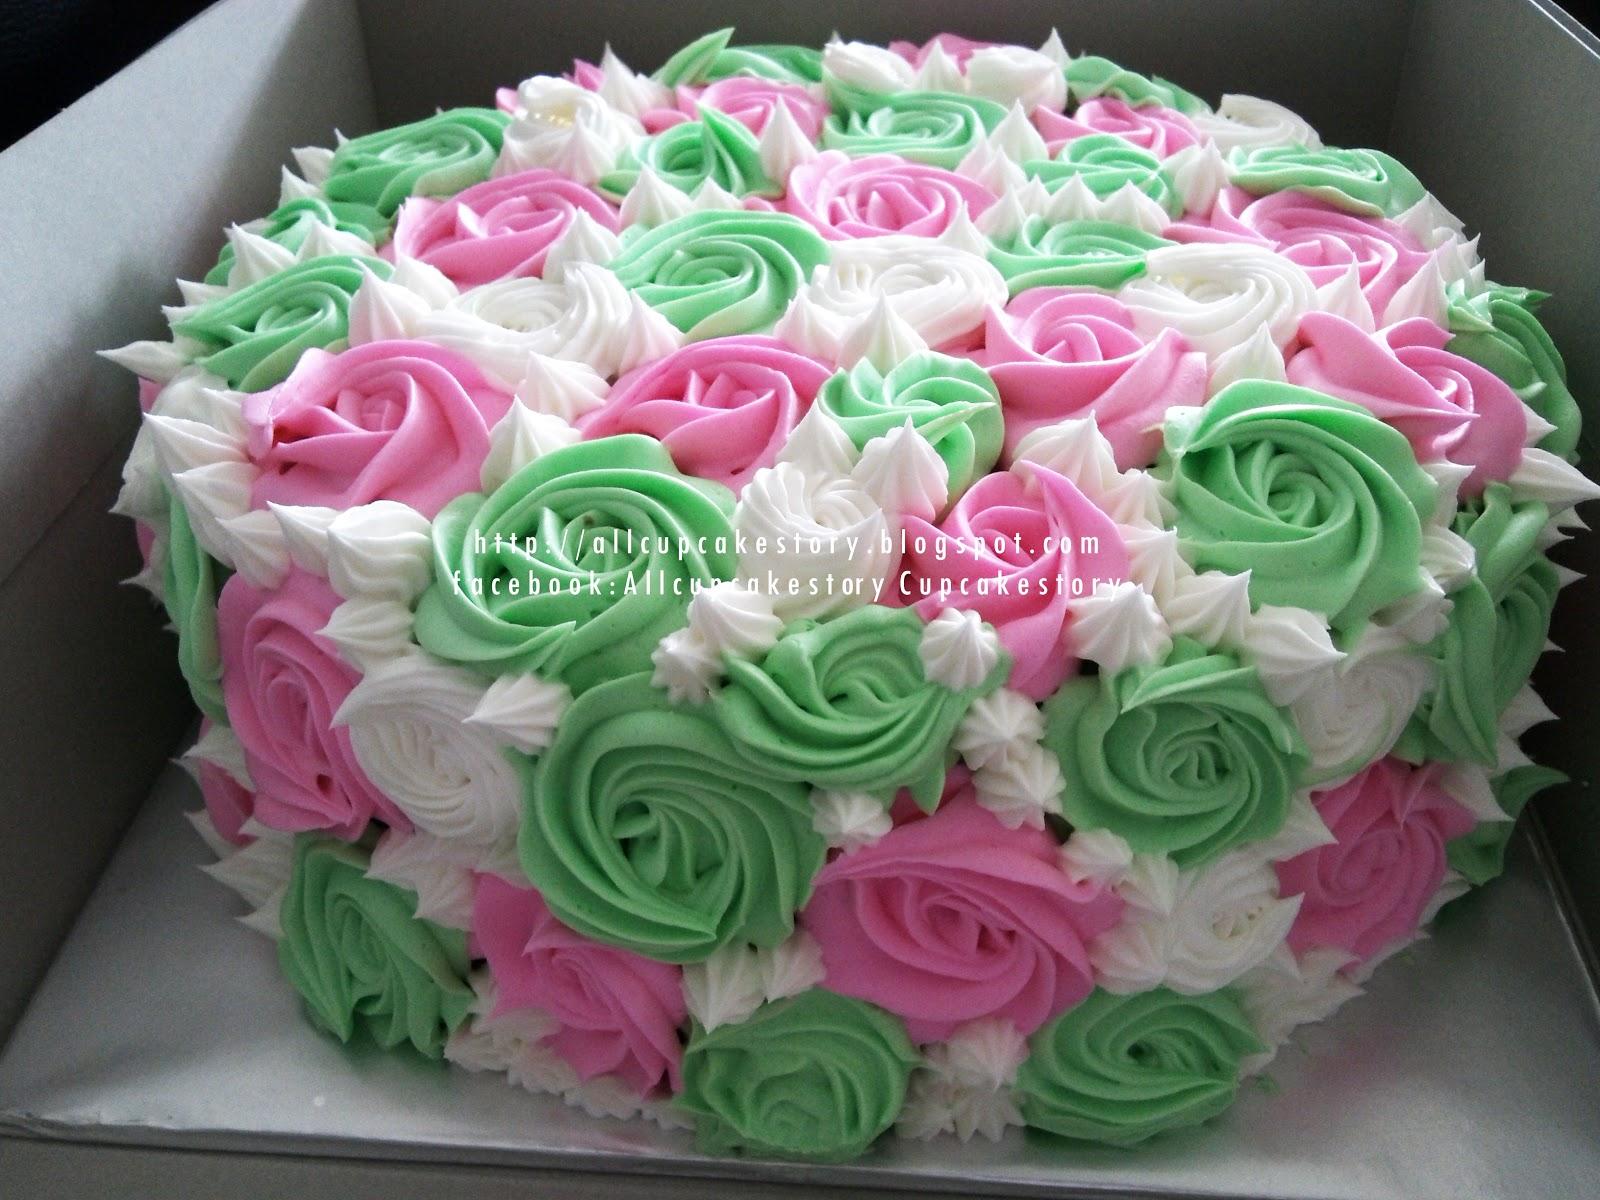 Green And Pink Roses allcupcakestory...